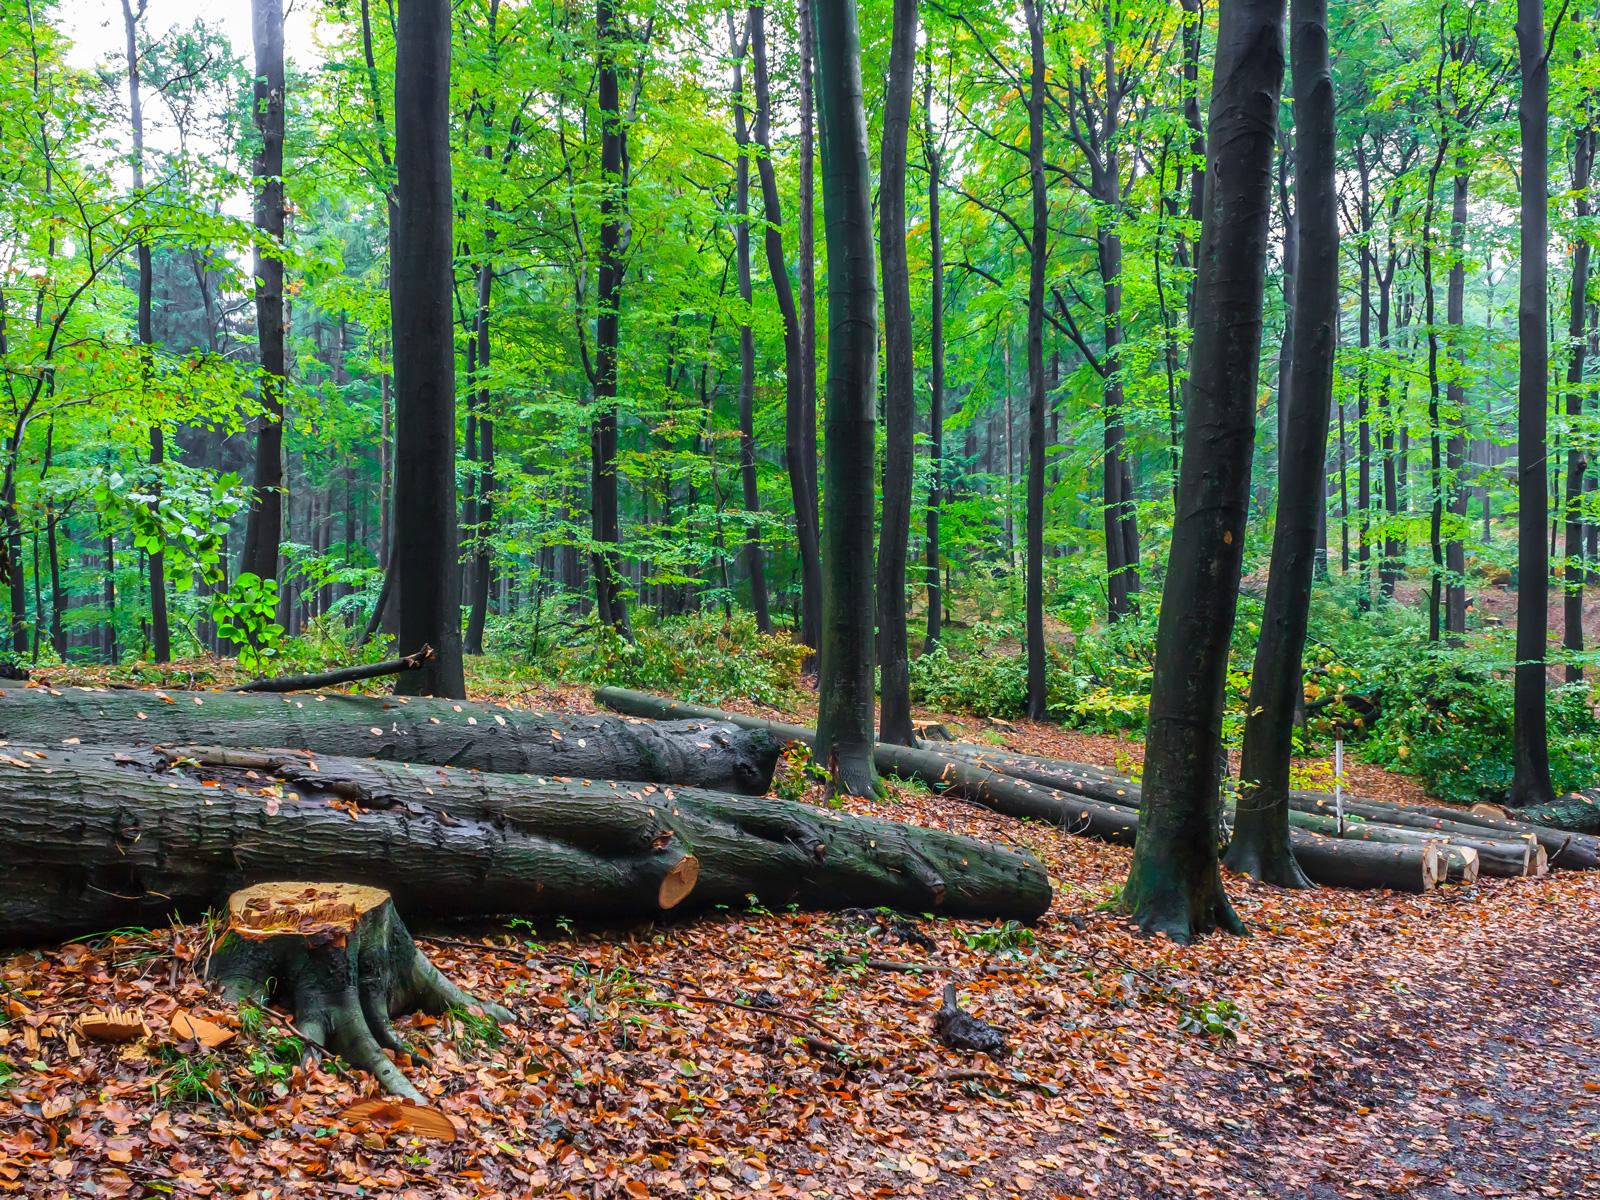 Buchenlangholz am Rande des Forstwegs